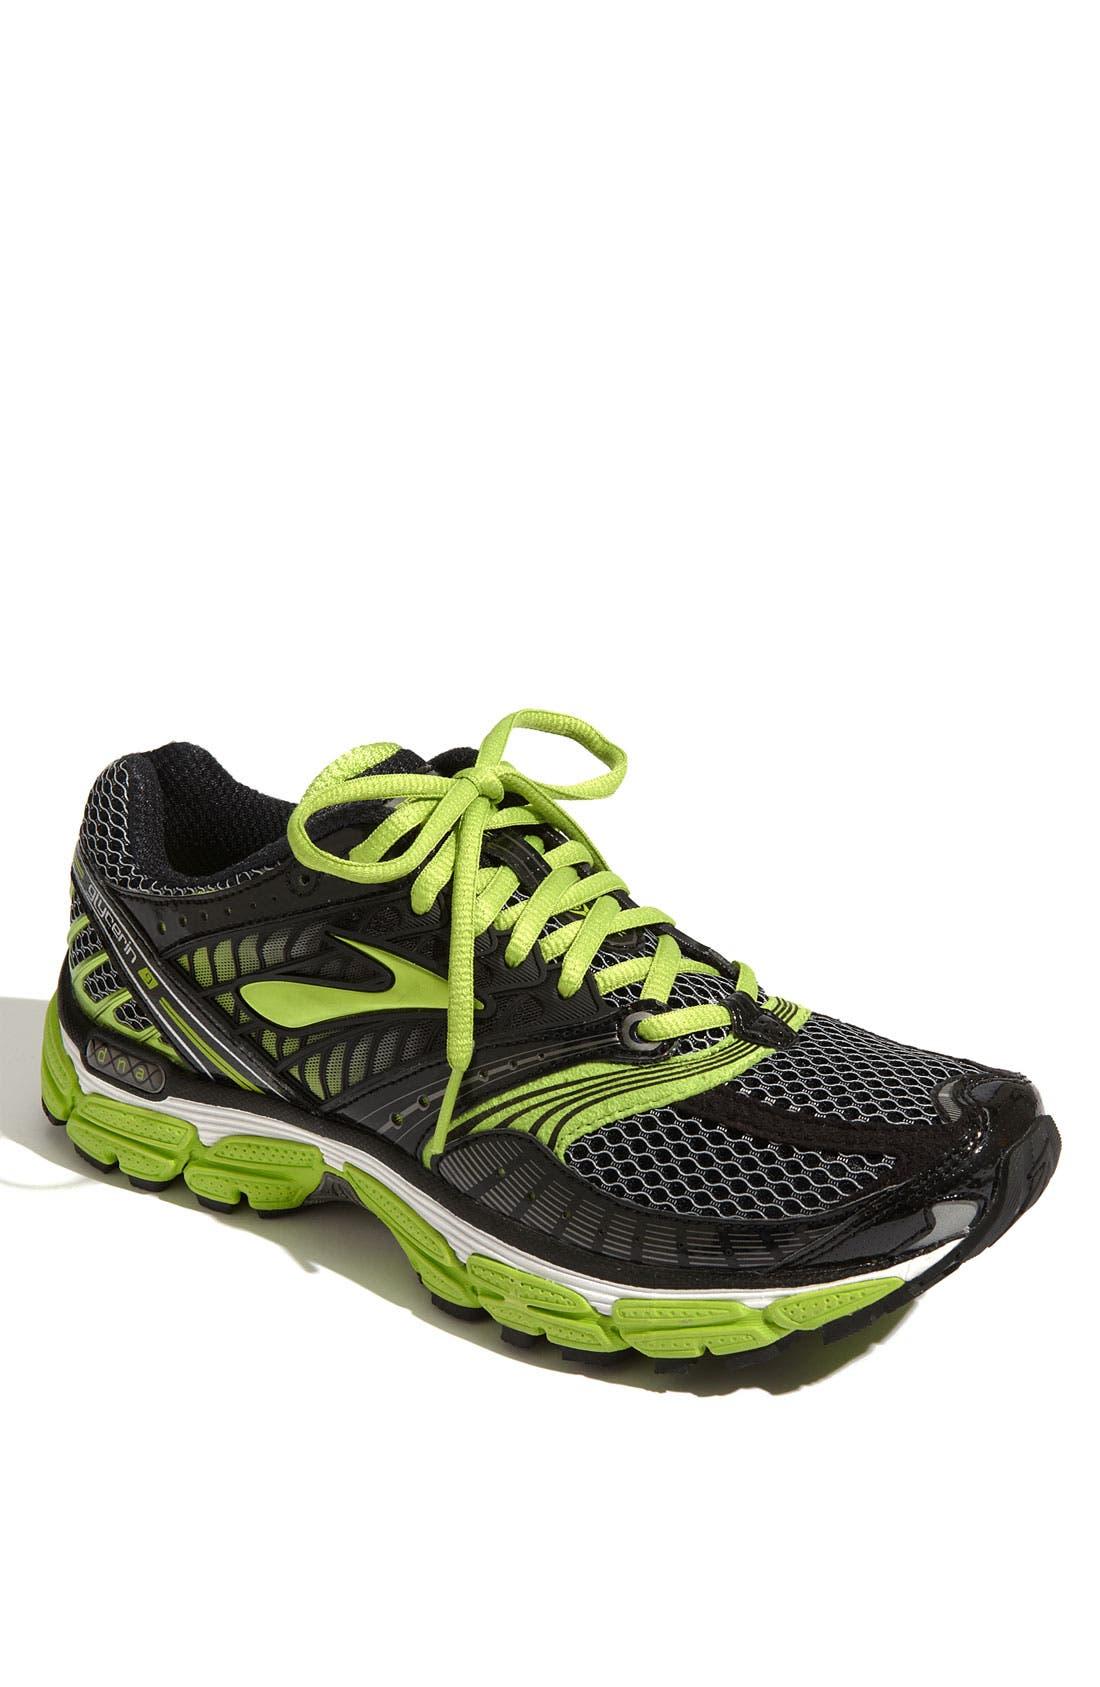 Alternate Image 1 Selected - Brooks 'Glycerin 9' Running Shoe (Men)